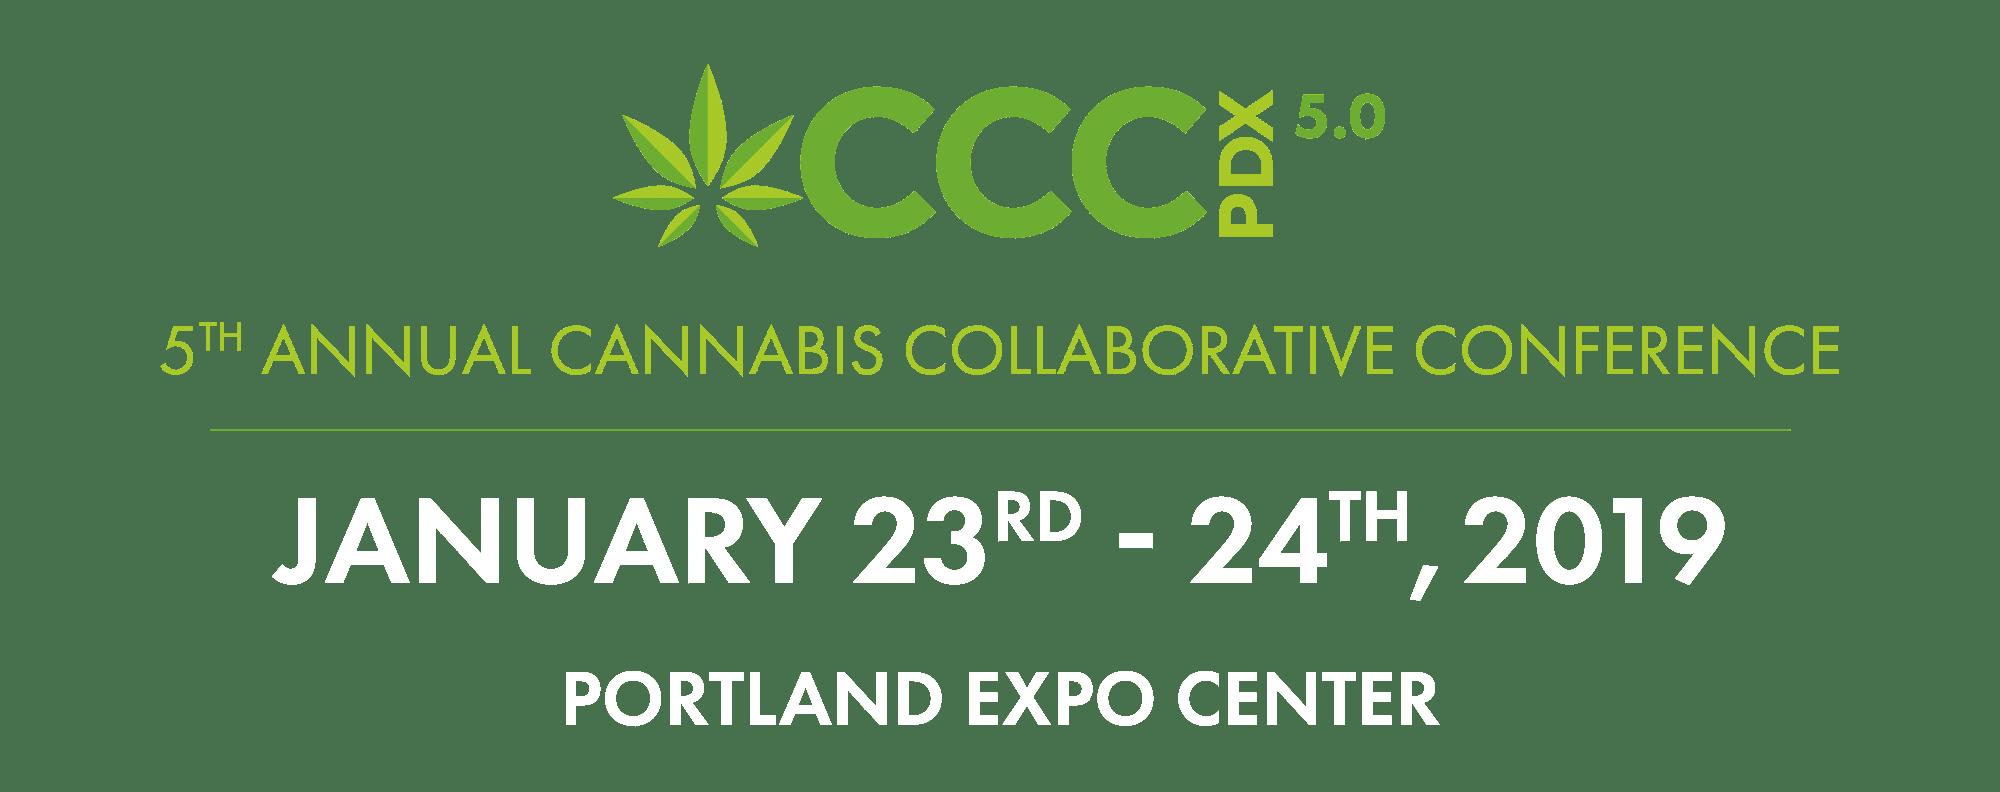 Home - Cannabis Collaborative Conference